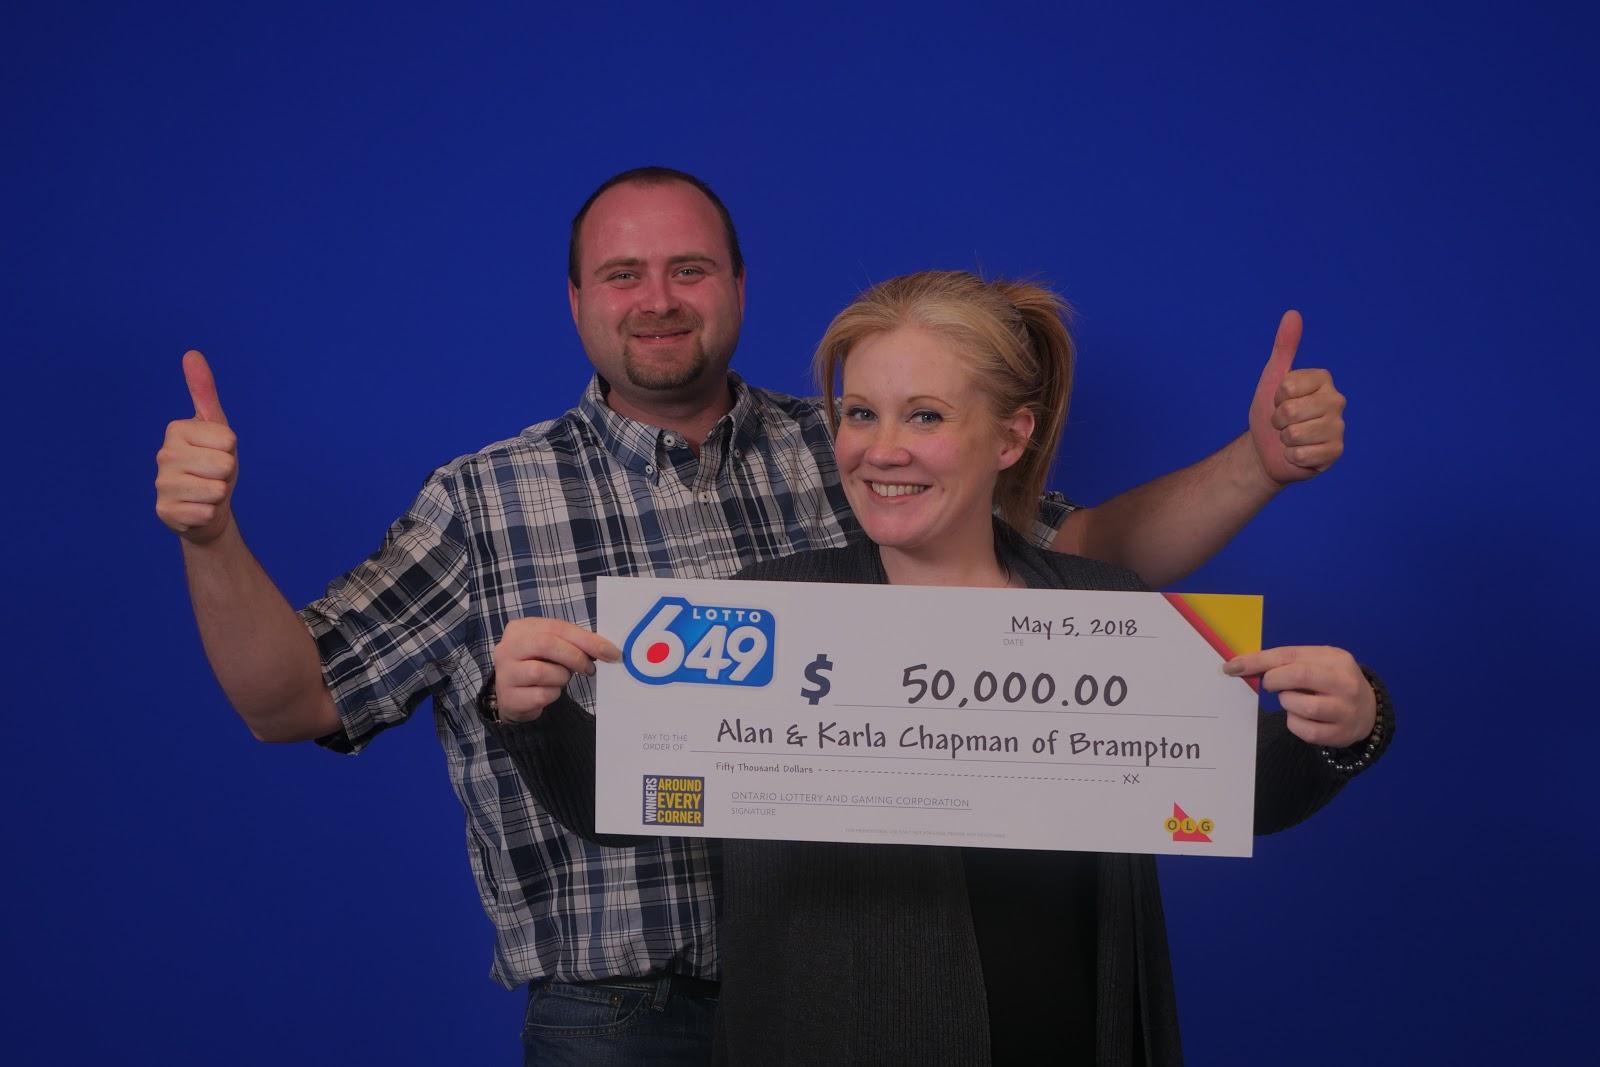 Brampton Couple Celebrating Big Lotto Win | inbrampton.com